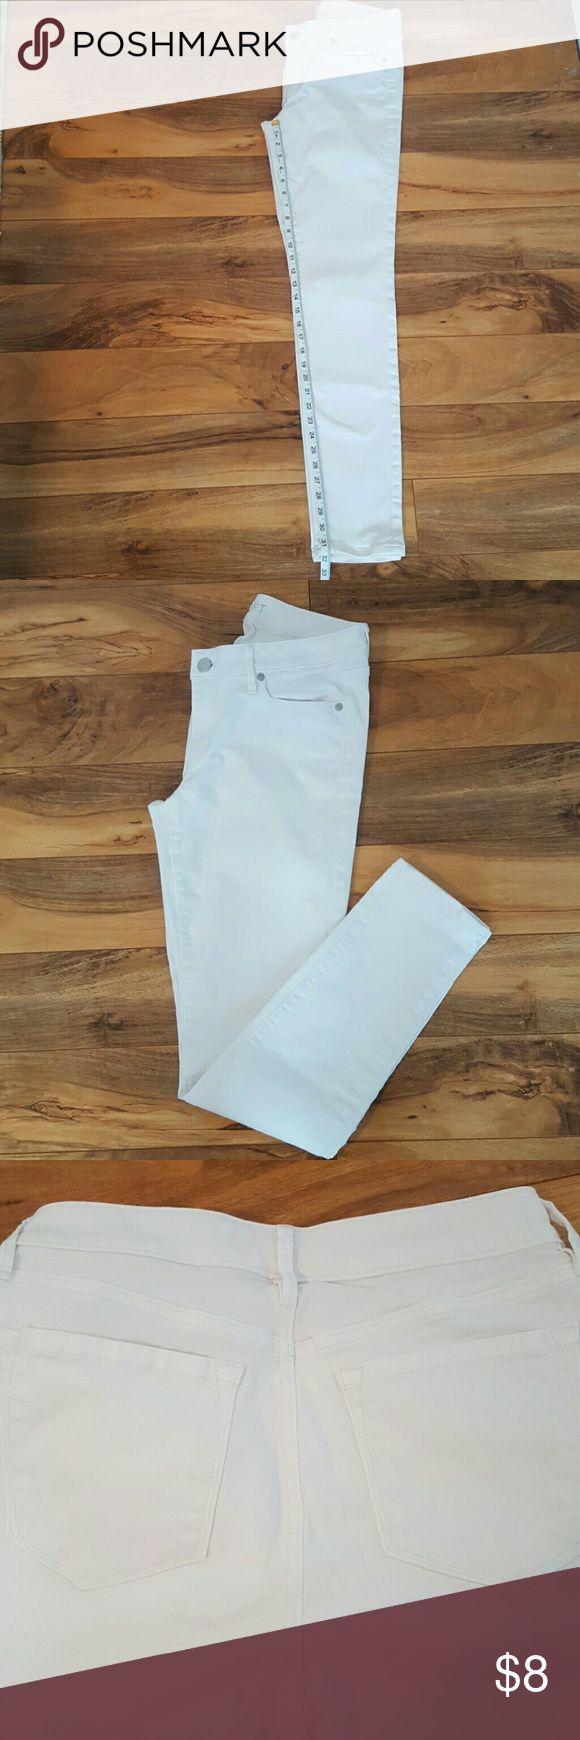 Ann Taylor Loft Curvy Skinny White Jeans